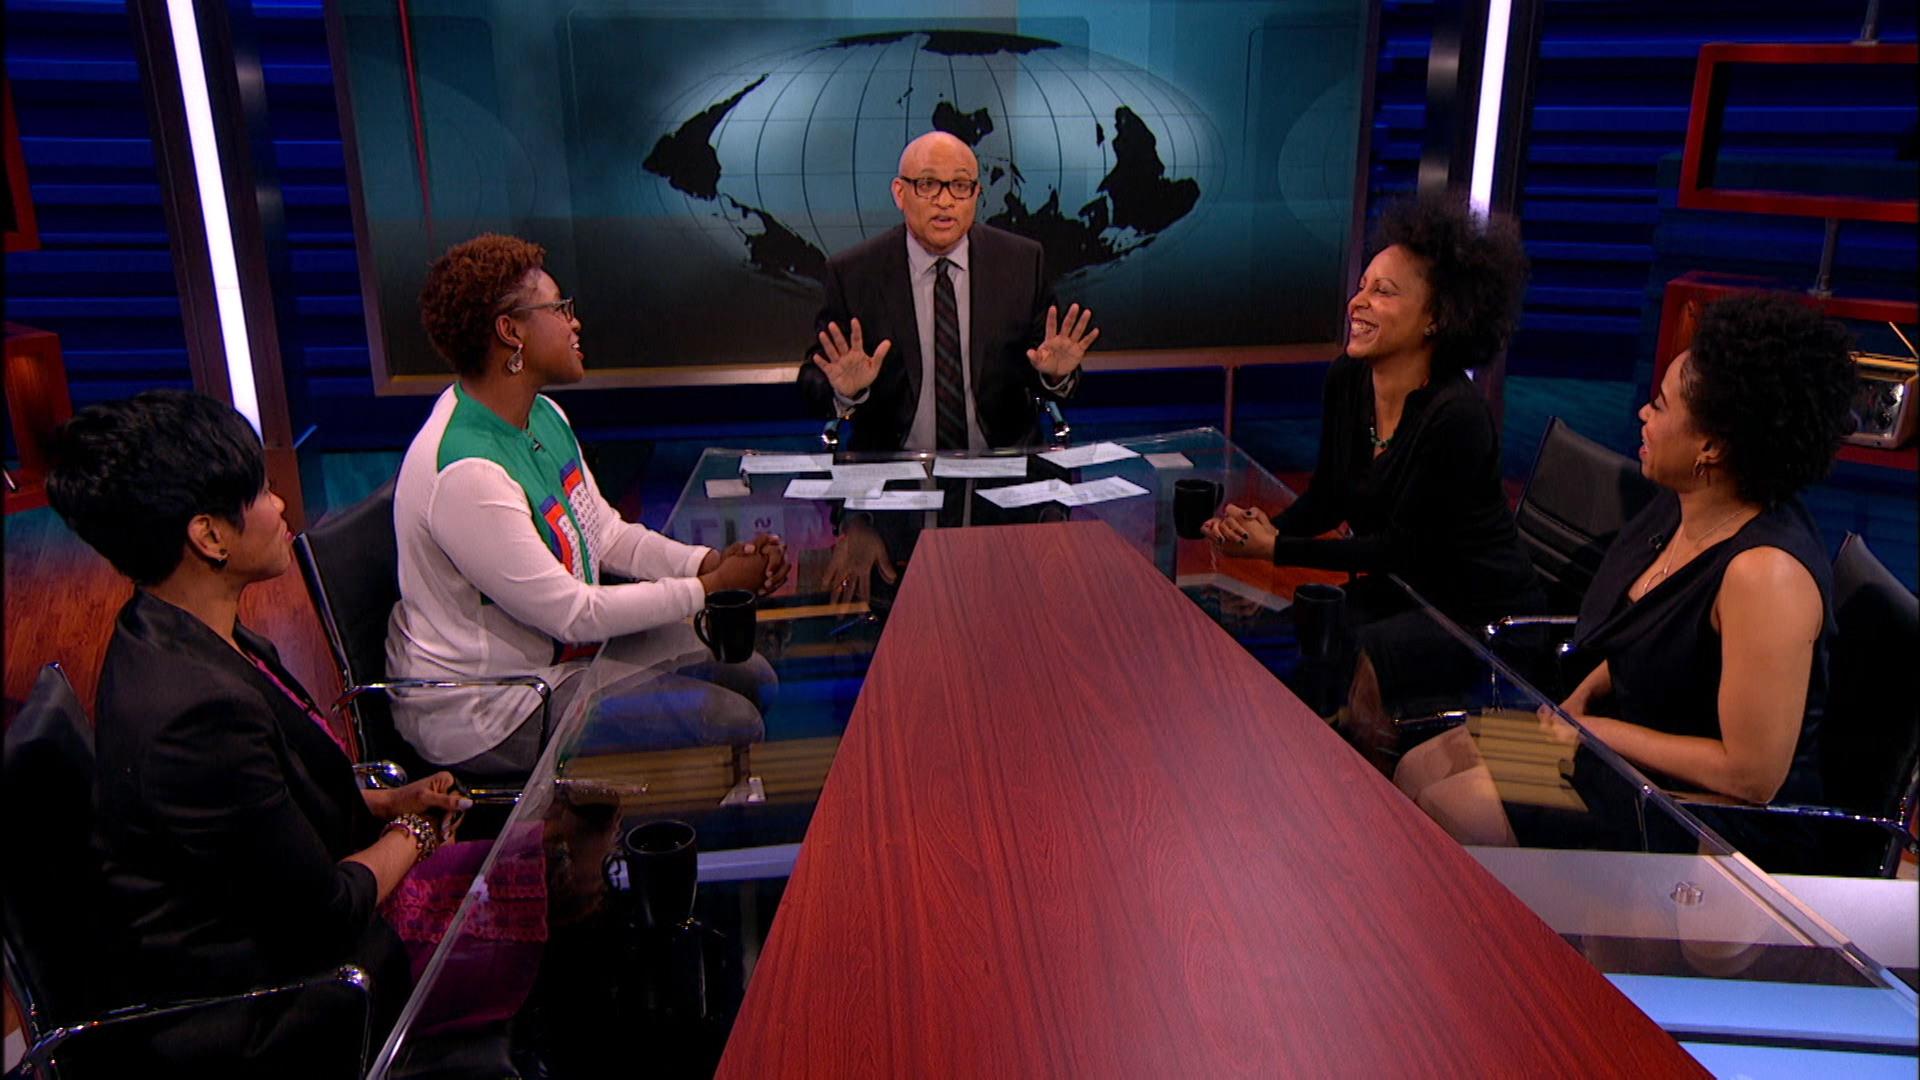 February 26, 2015 - Black Women in America